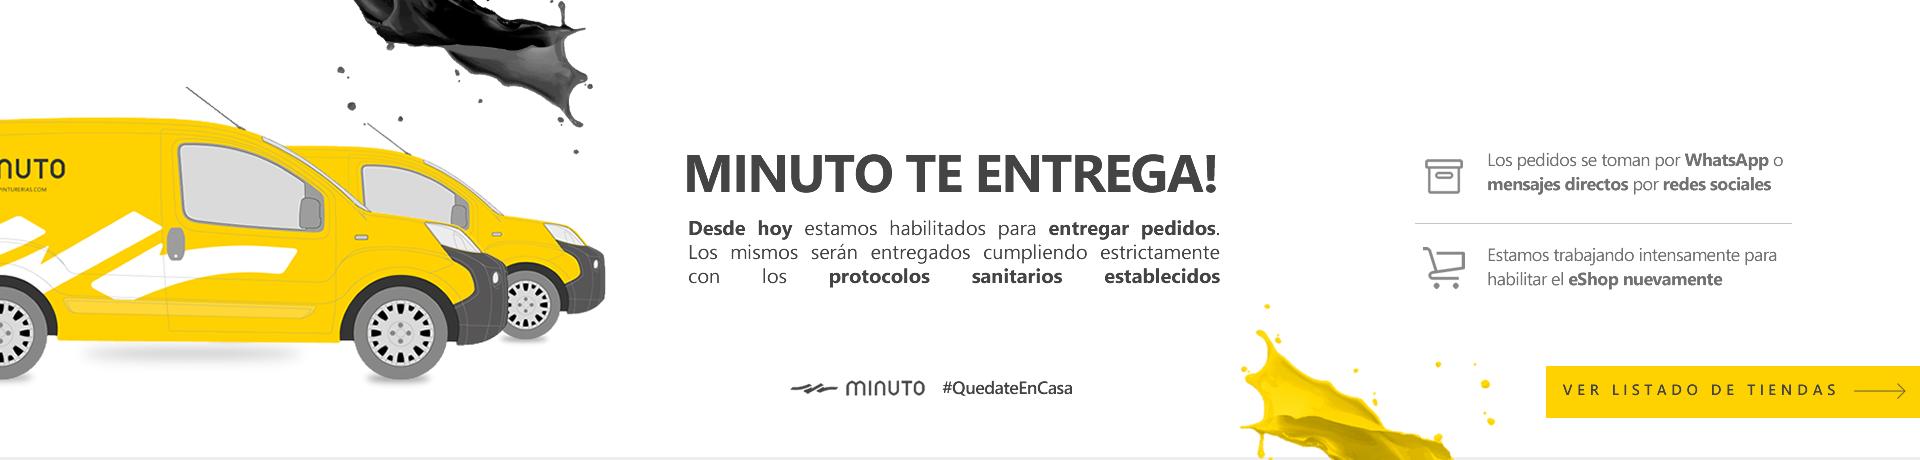 Minuto Entrega